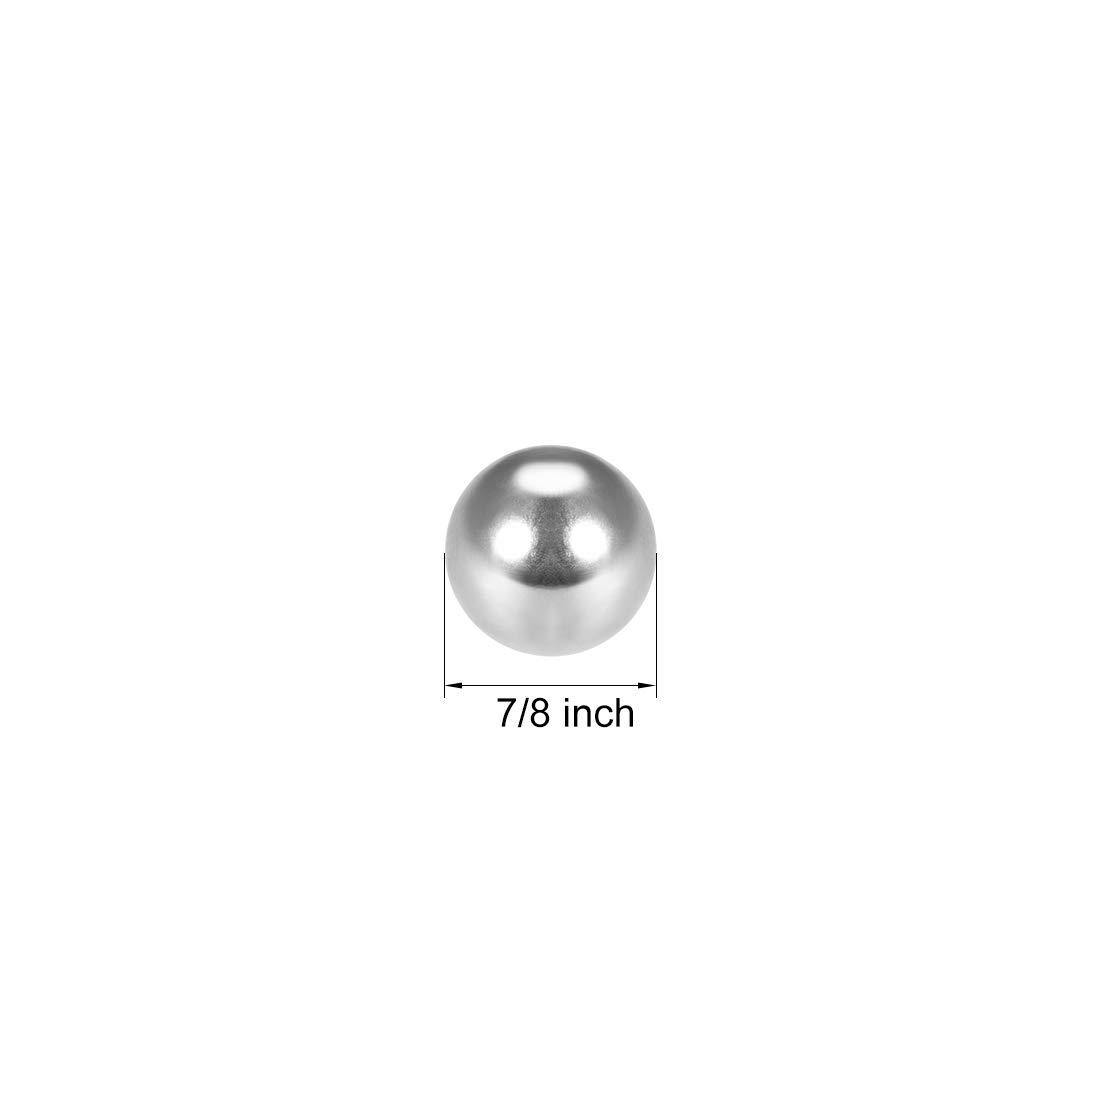 sourcing map 7//8 Inch Precision Chrome Steel Bearing Balls G25 10pcs